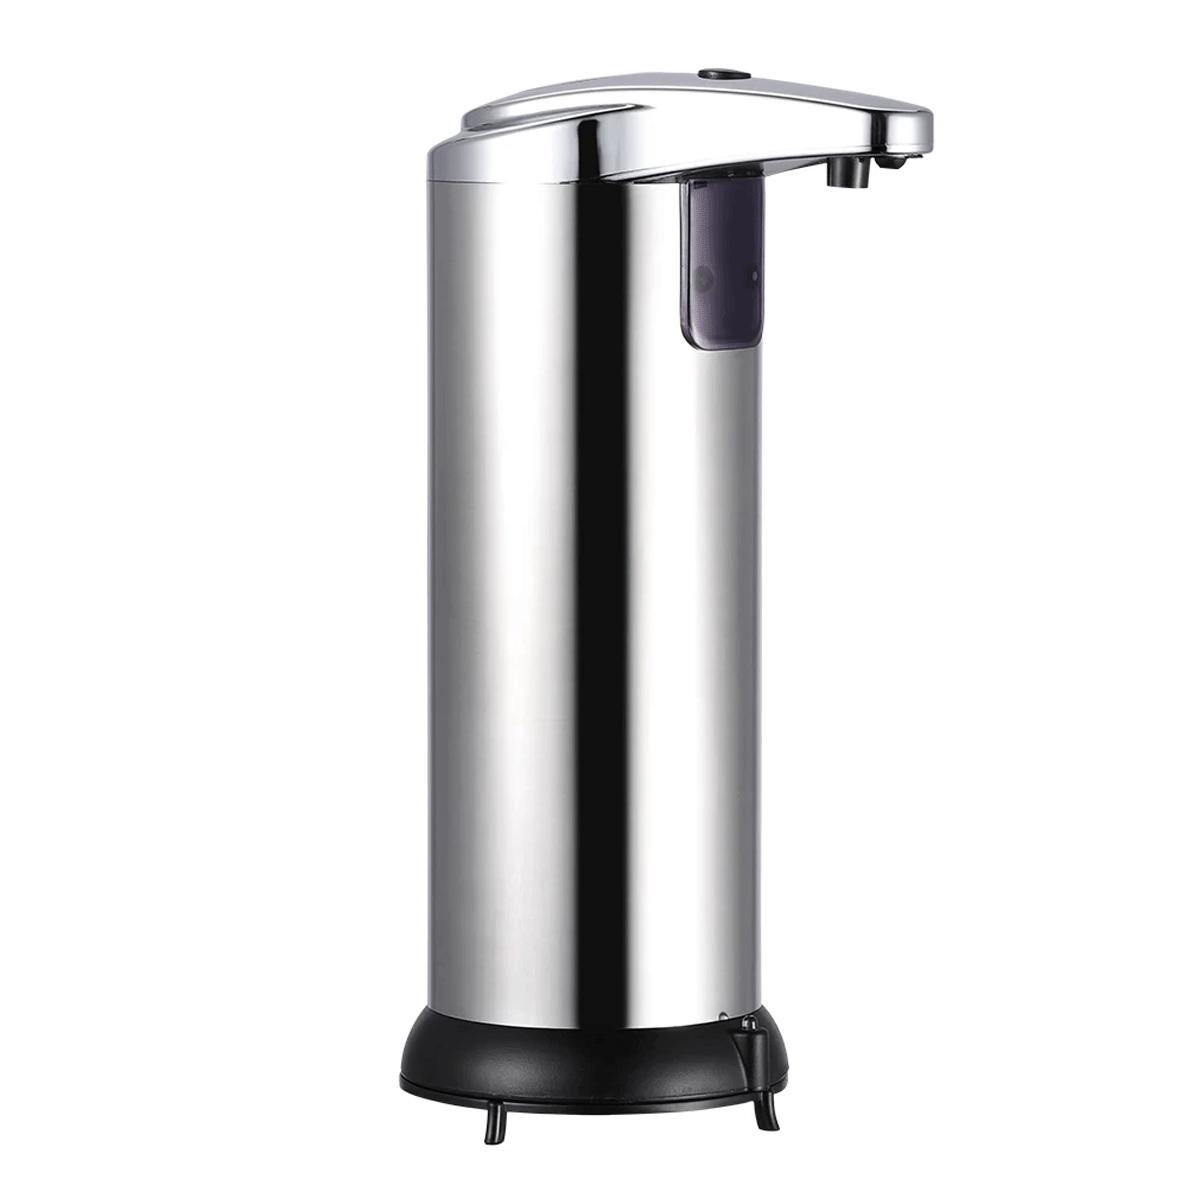 Dispenser automático de Álcool líquido